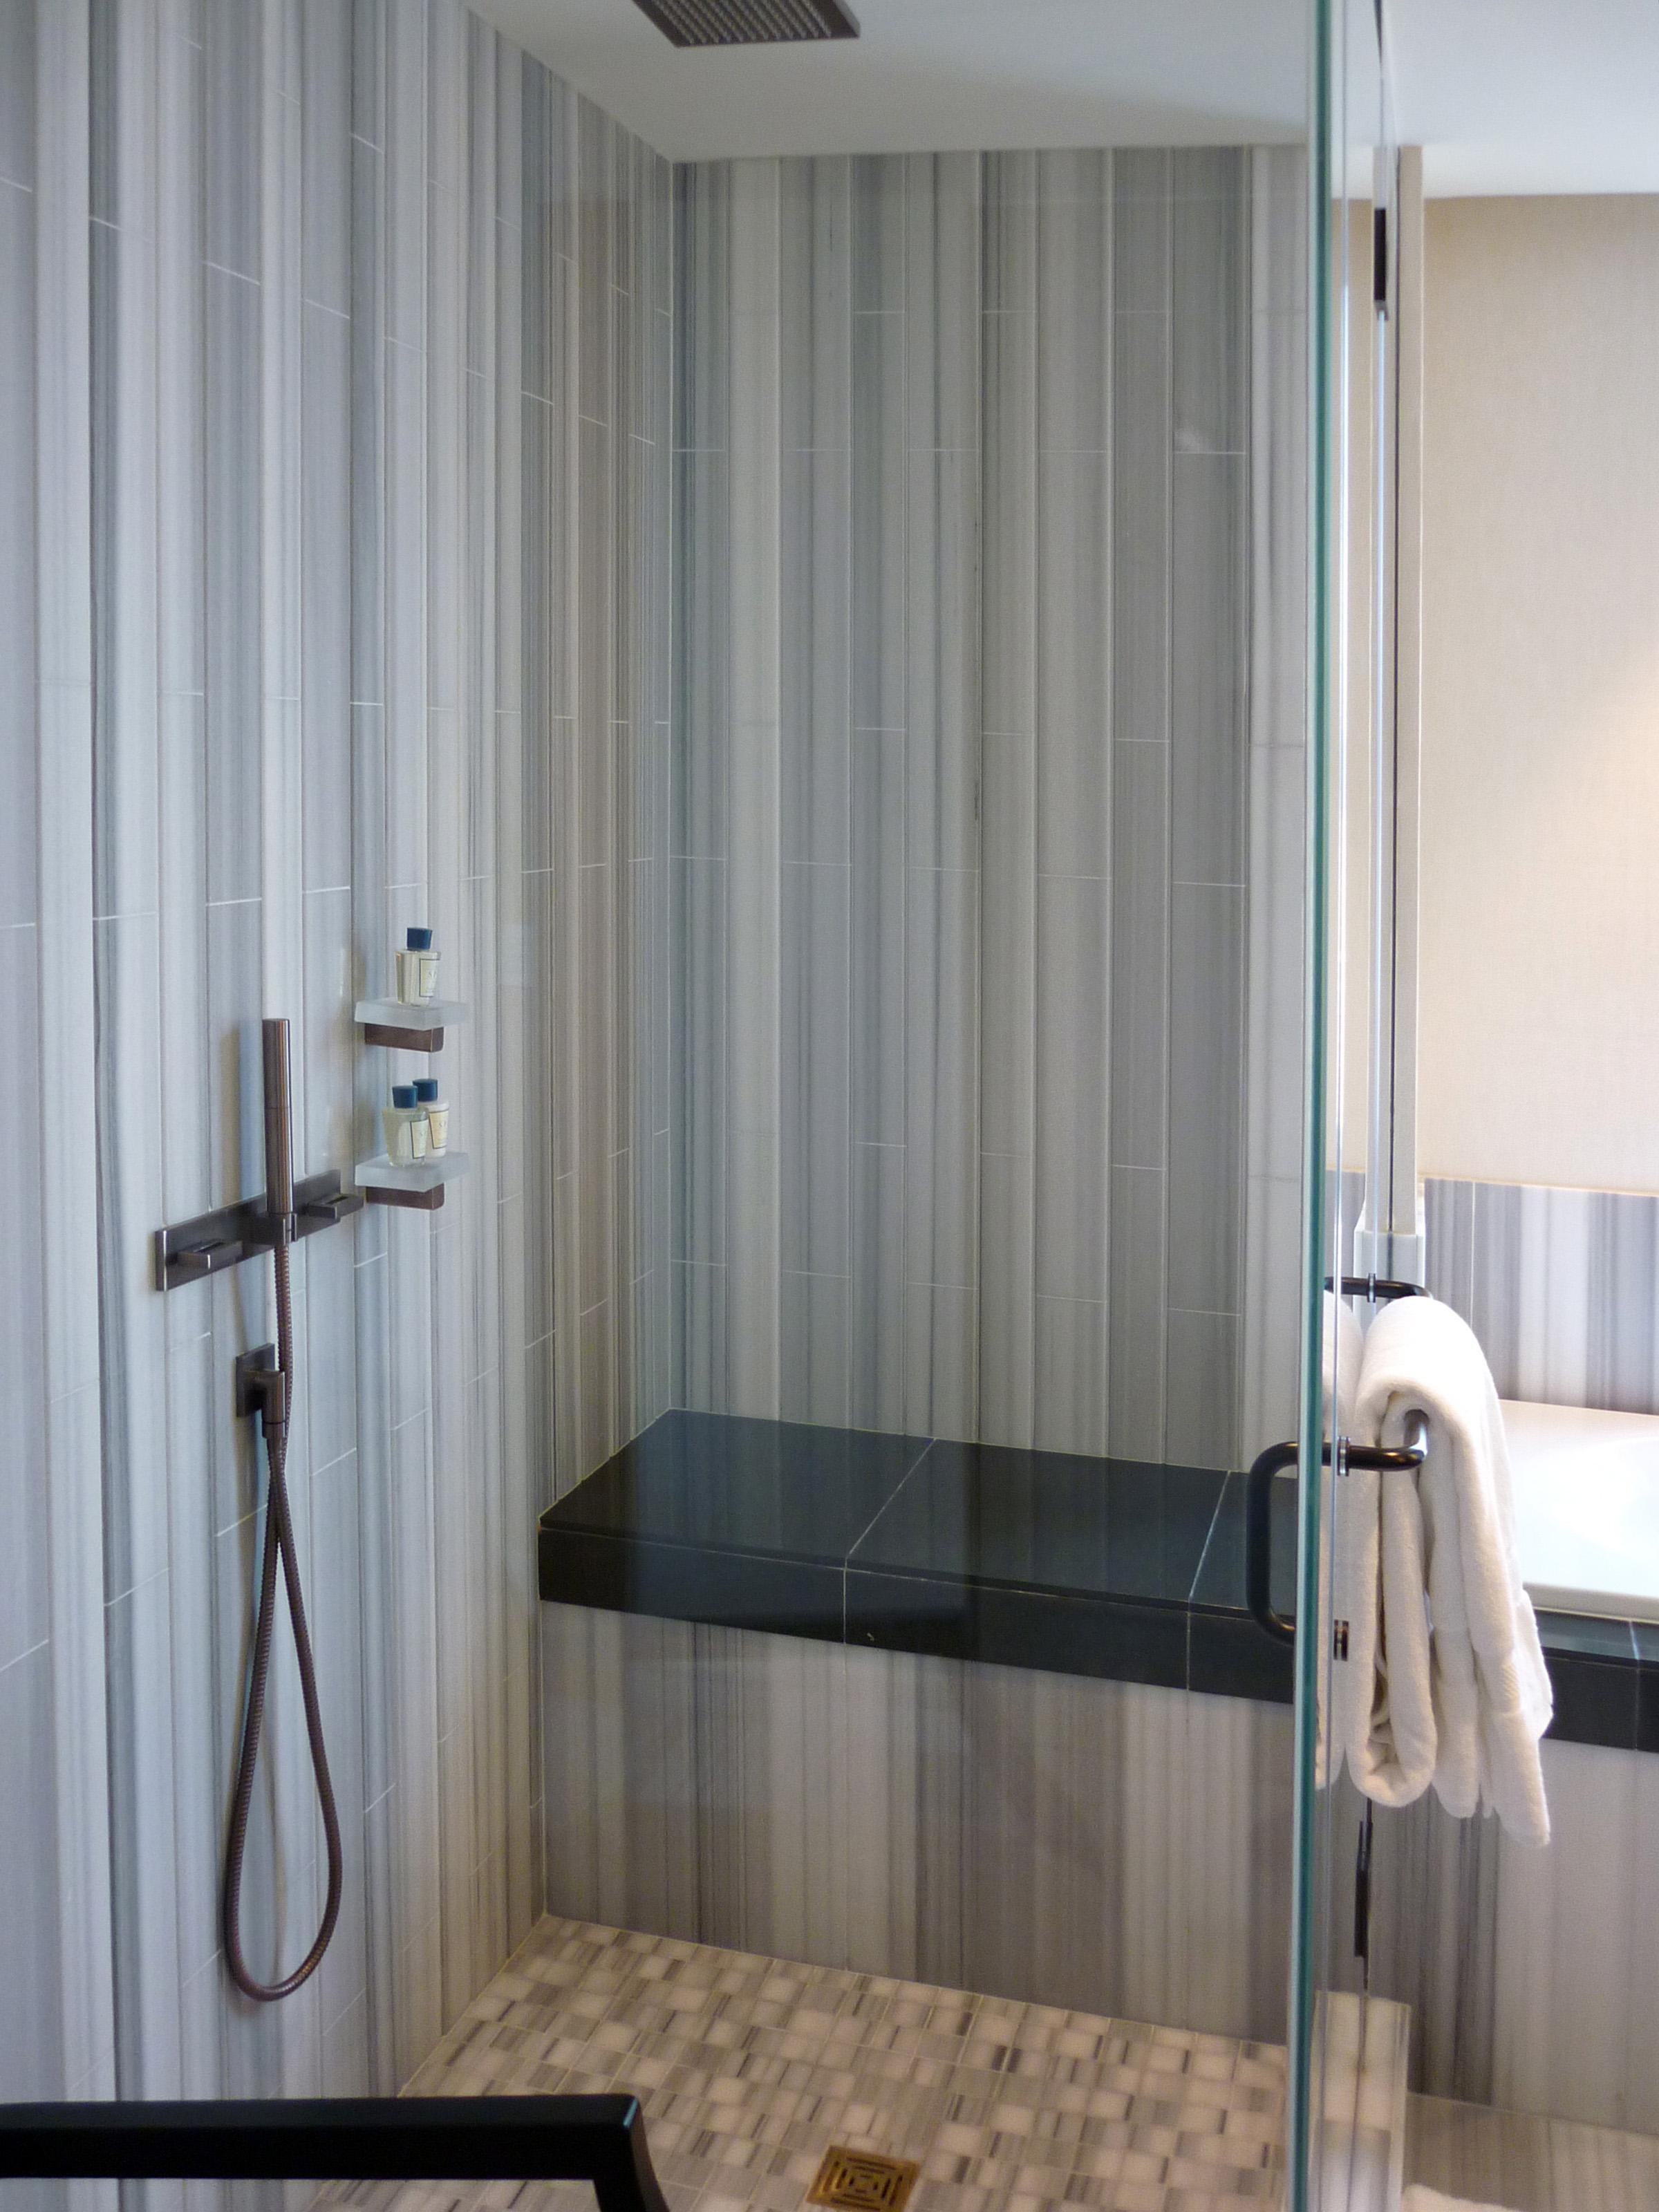 New Home Interior Design Images